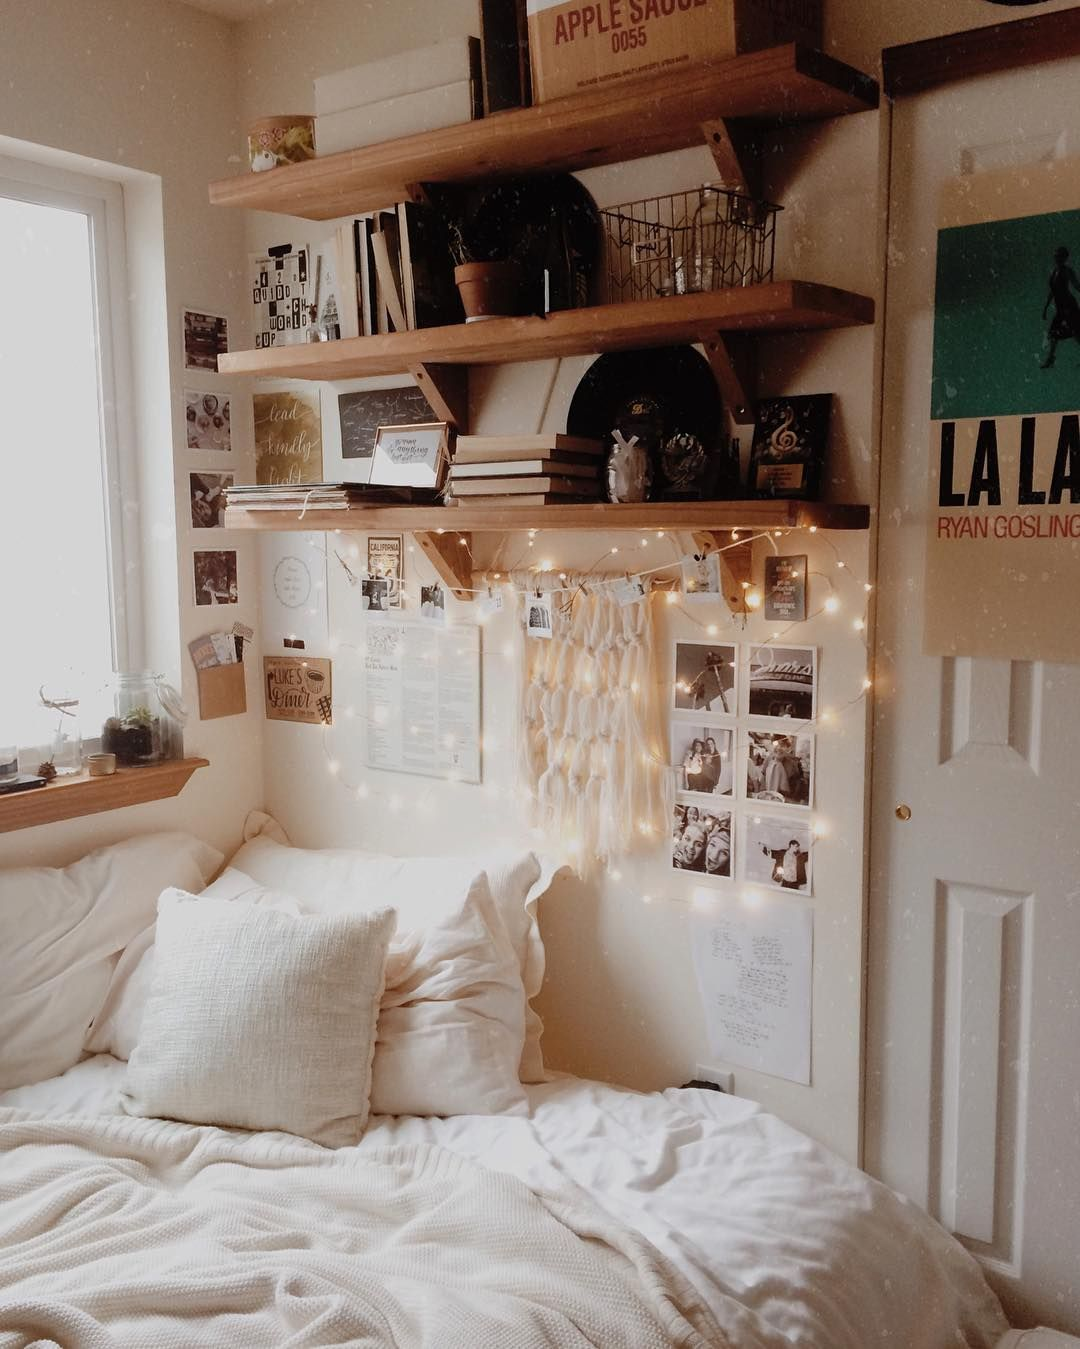 Romantisches schlafzimmer interieur  stonexoxstone  youtubeigpintumblr  snapchat